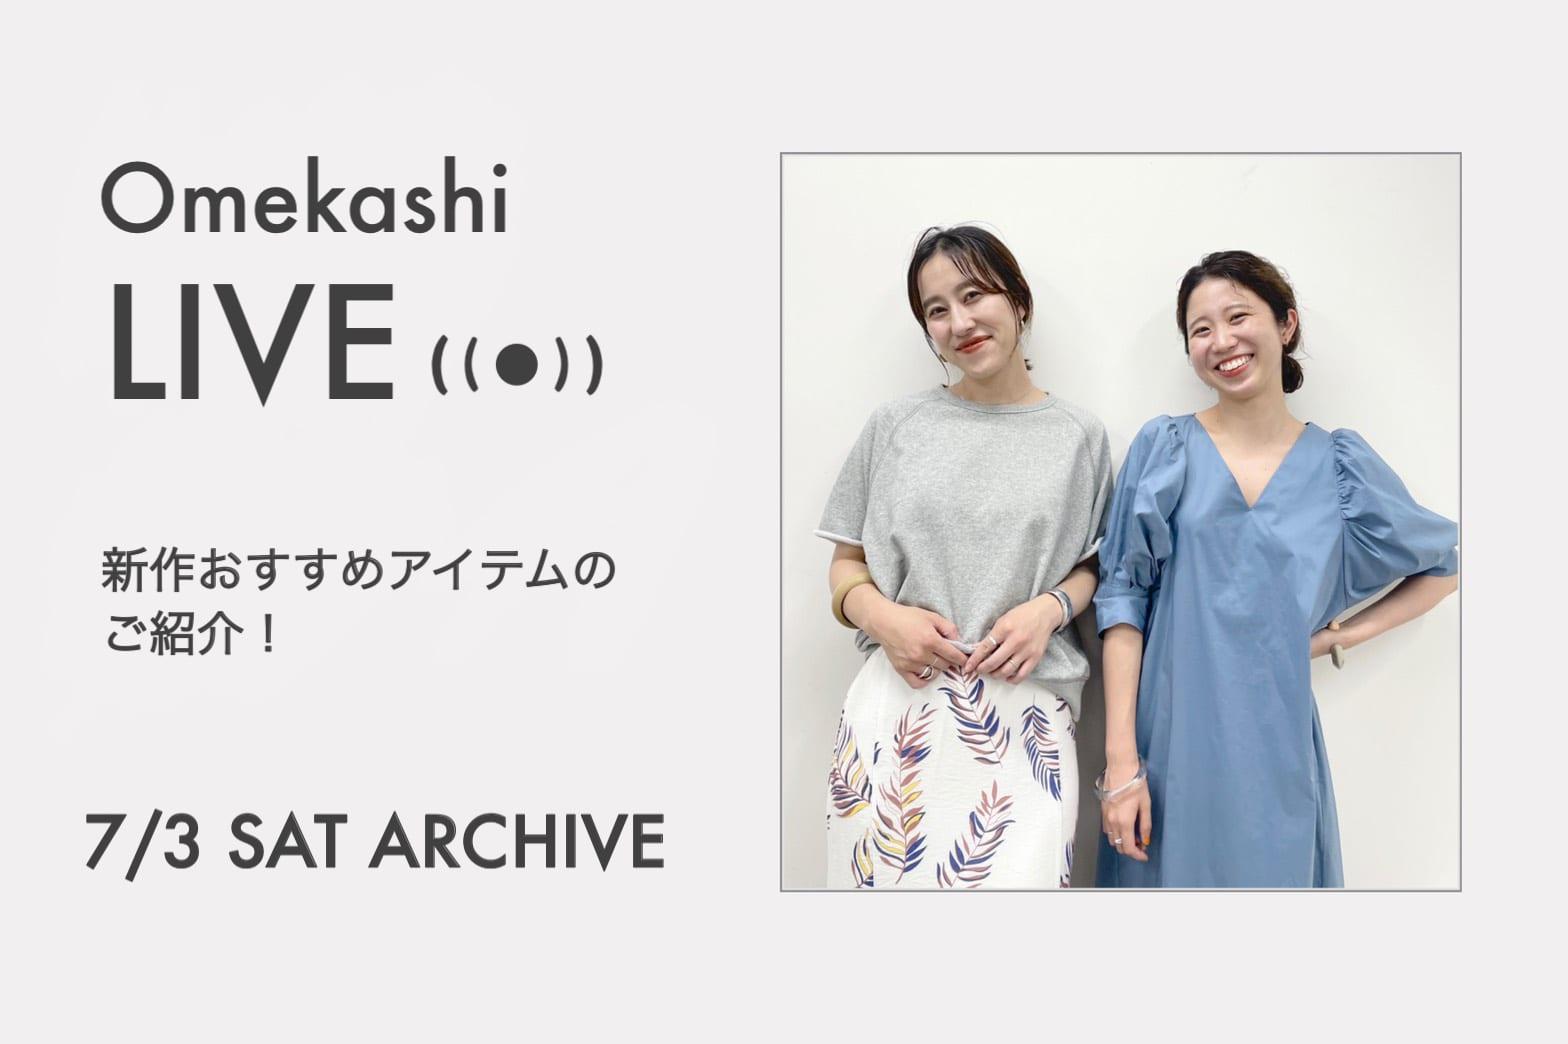 Omekashi 【Omekashi LIVE】7月3日(土)配信分アーカイブ 新作おすすめアイテムのご紹介!